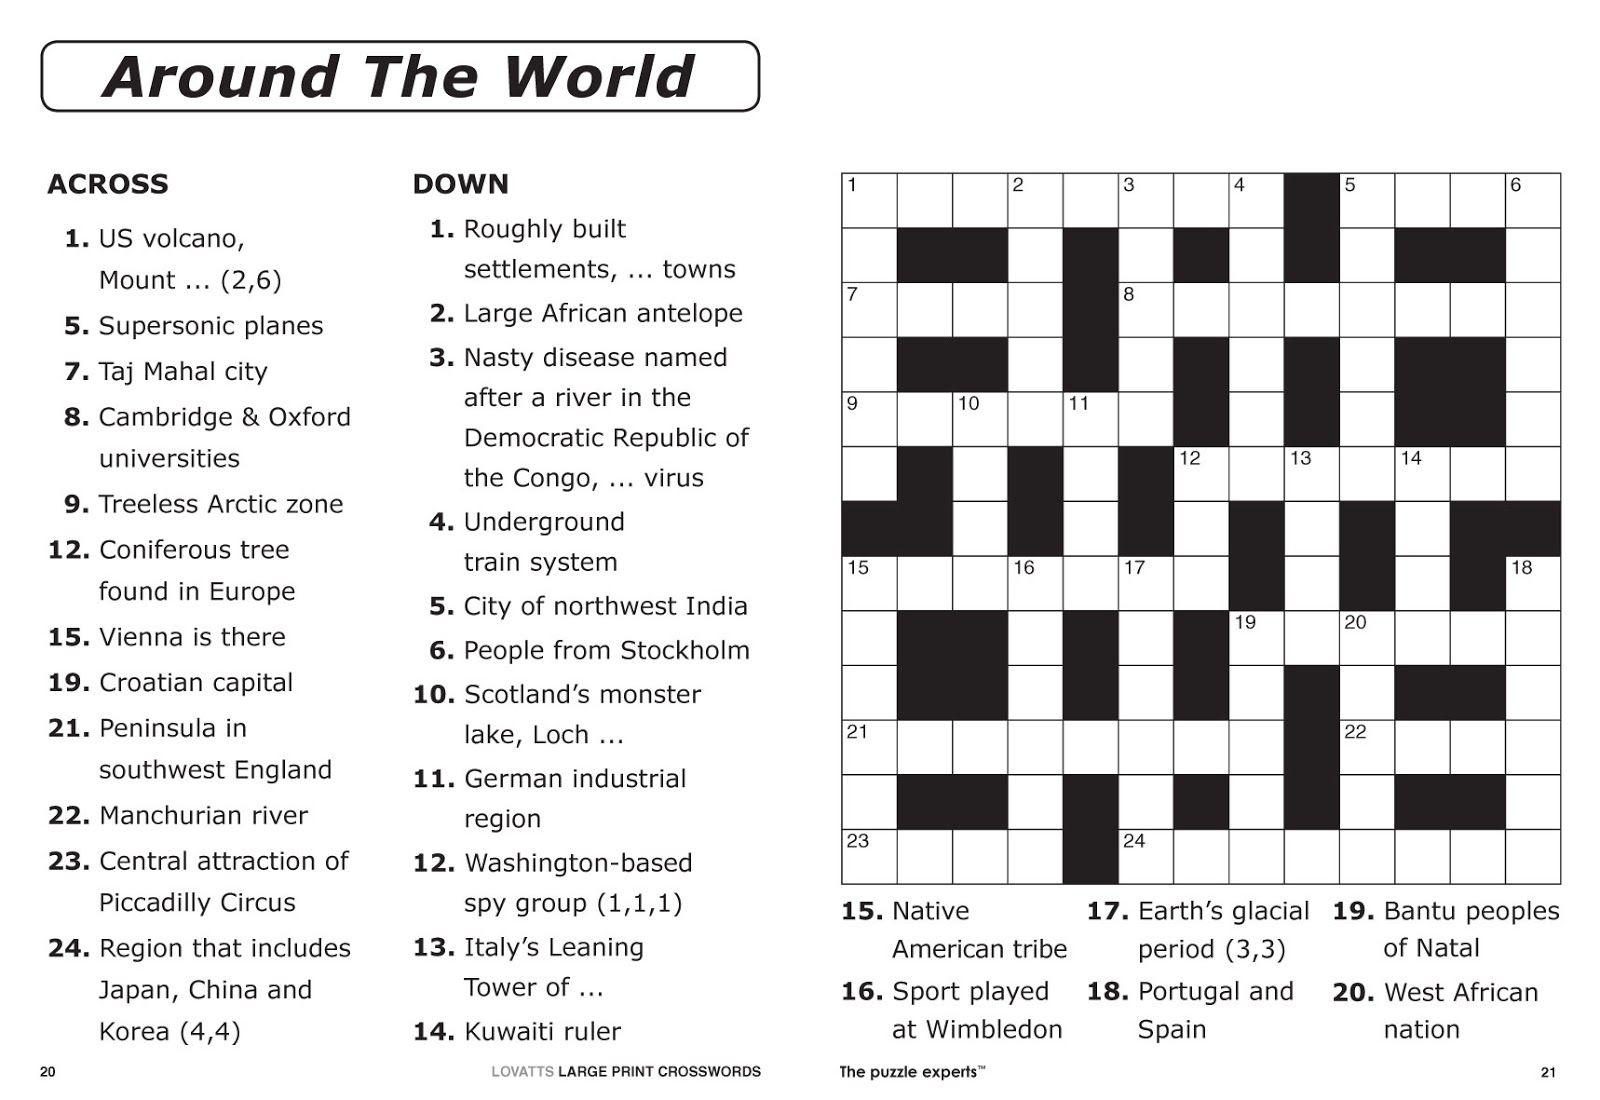 Free Printable Large Print Crossword Puzzles | M3U8 - Printable Crossword Puzzles Pdf Easy